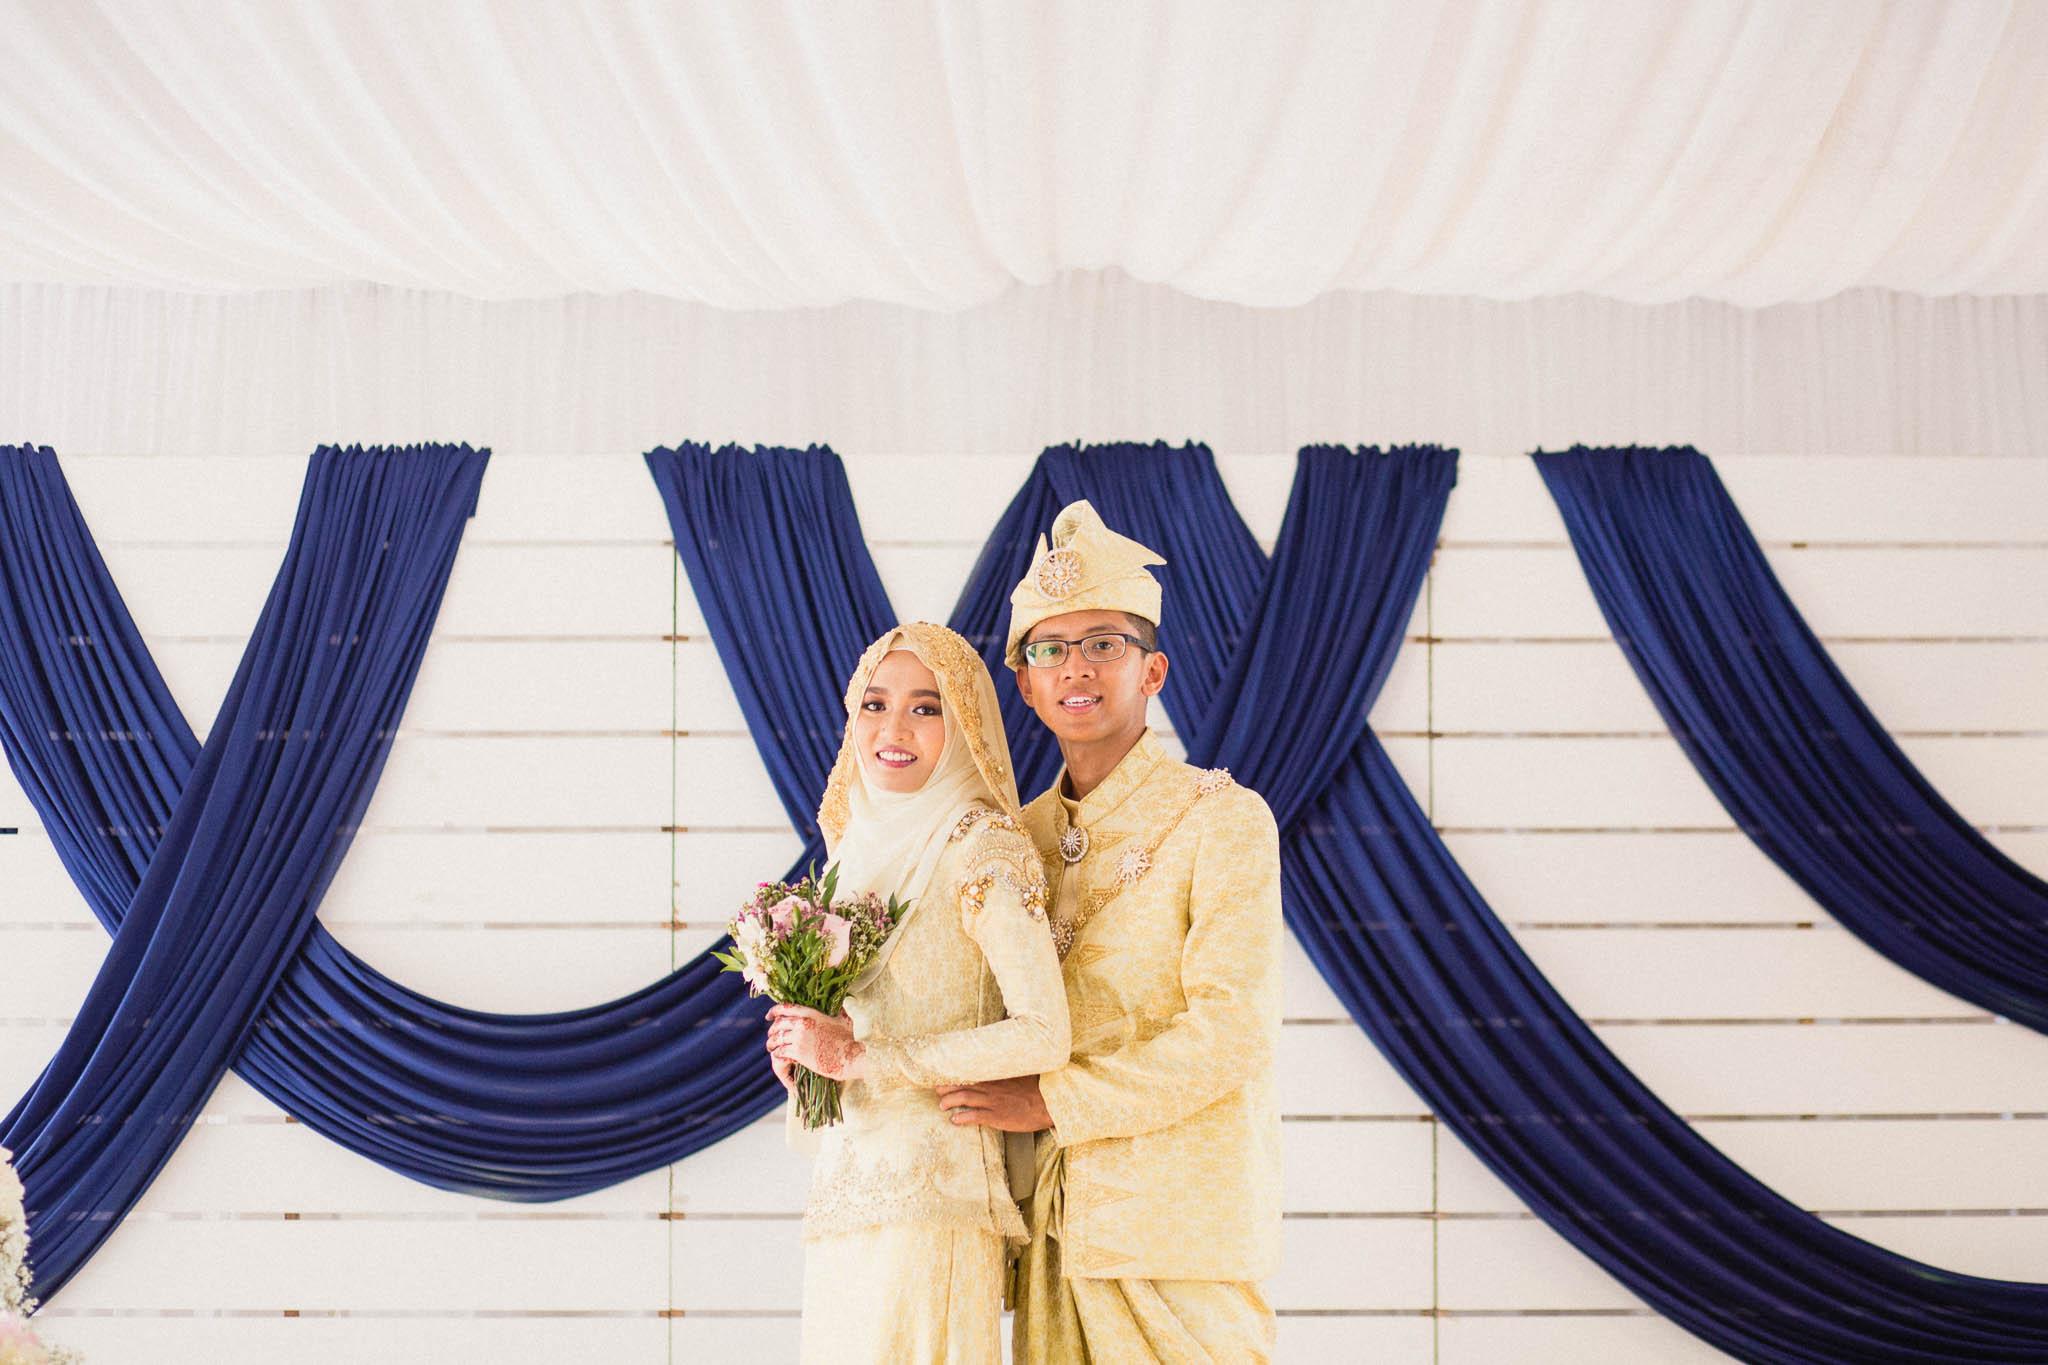 singapore-wedding-photographer-sharalyn-syazwan-054.jpg